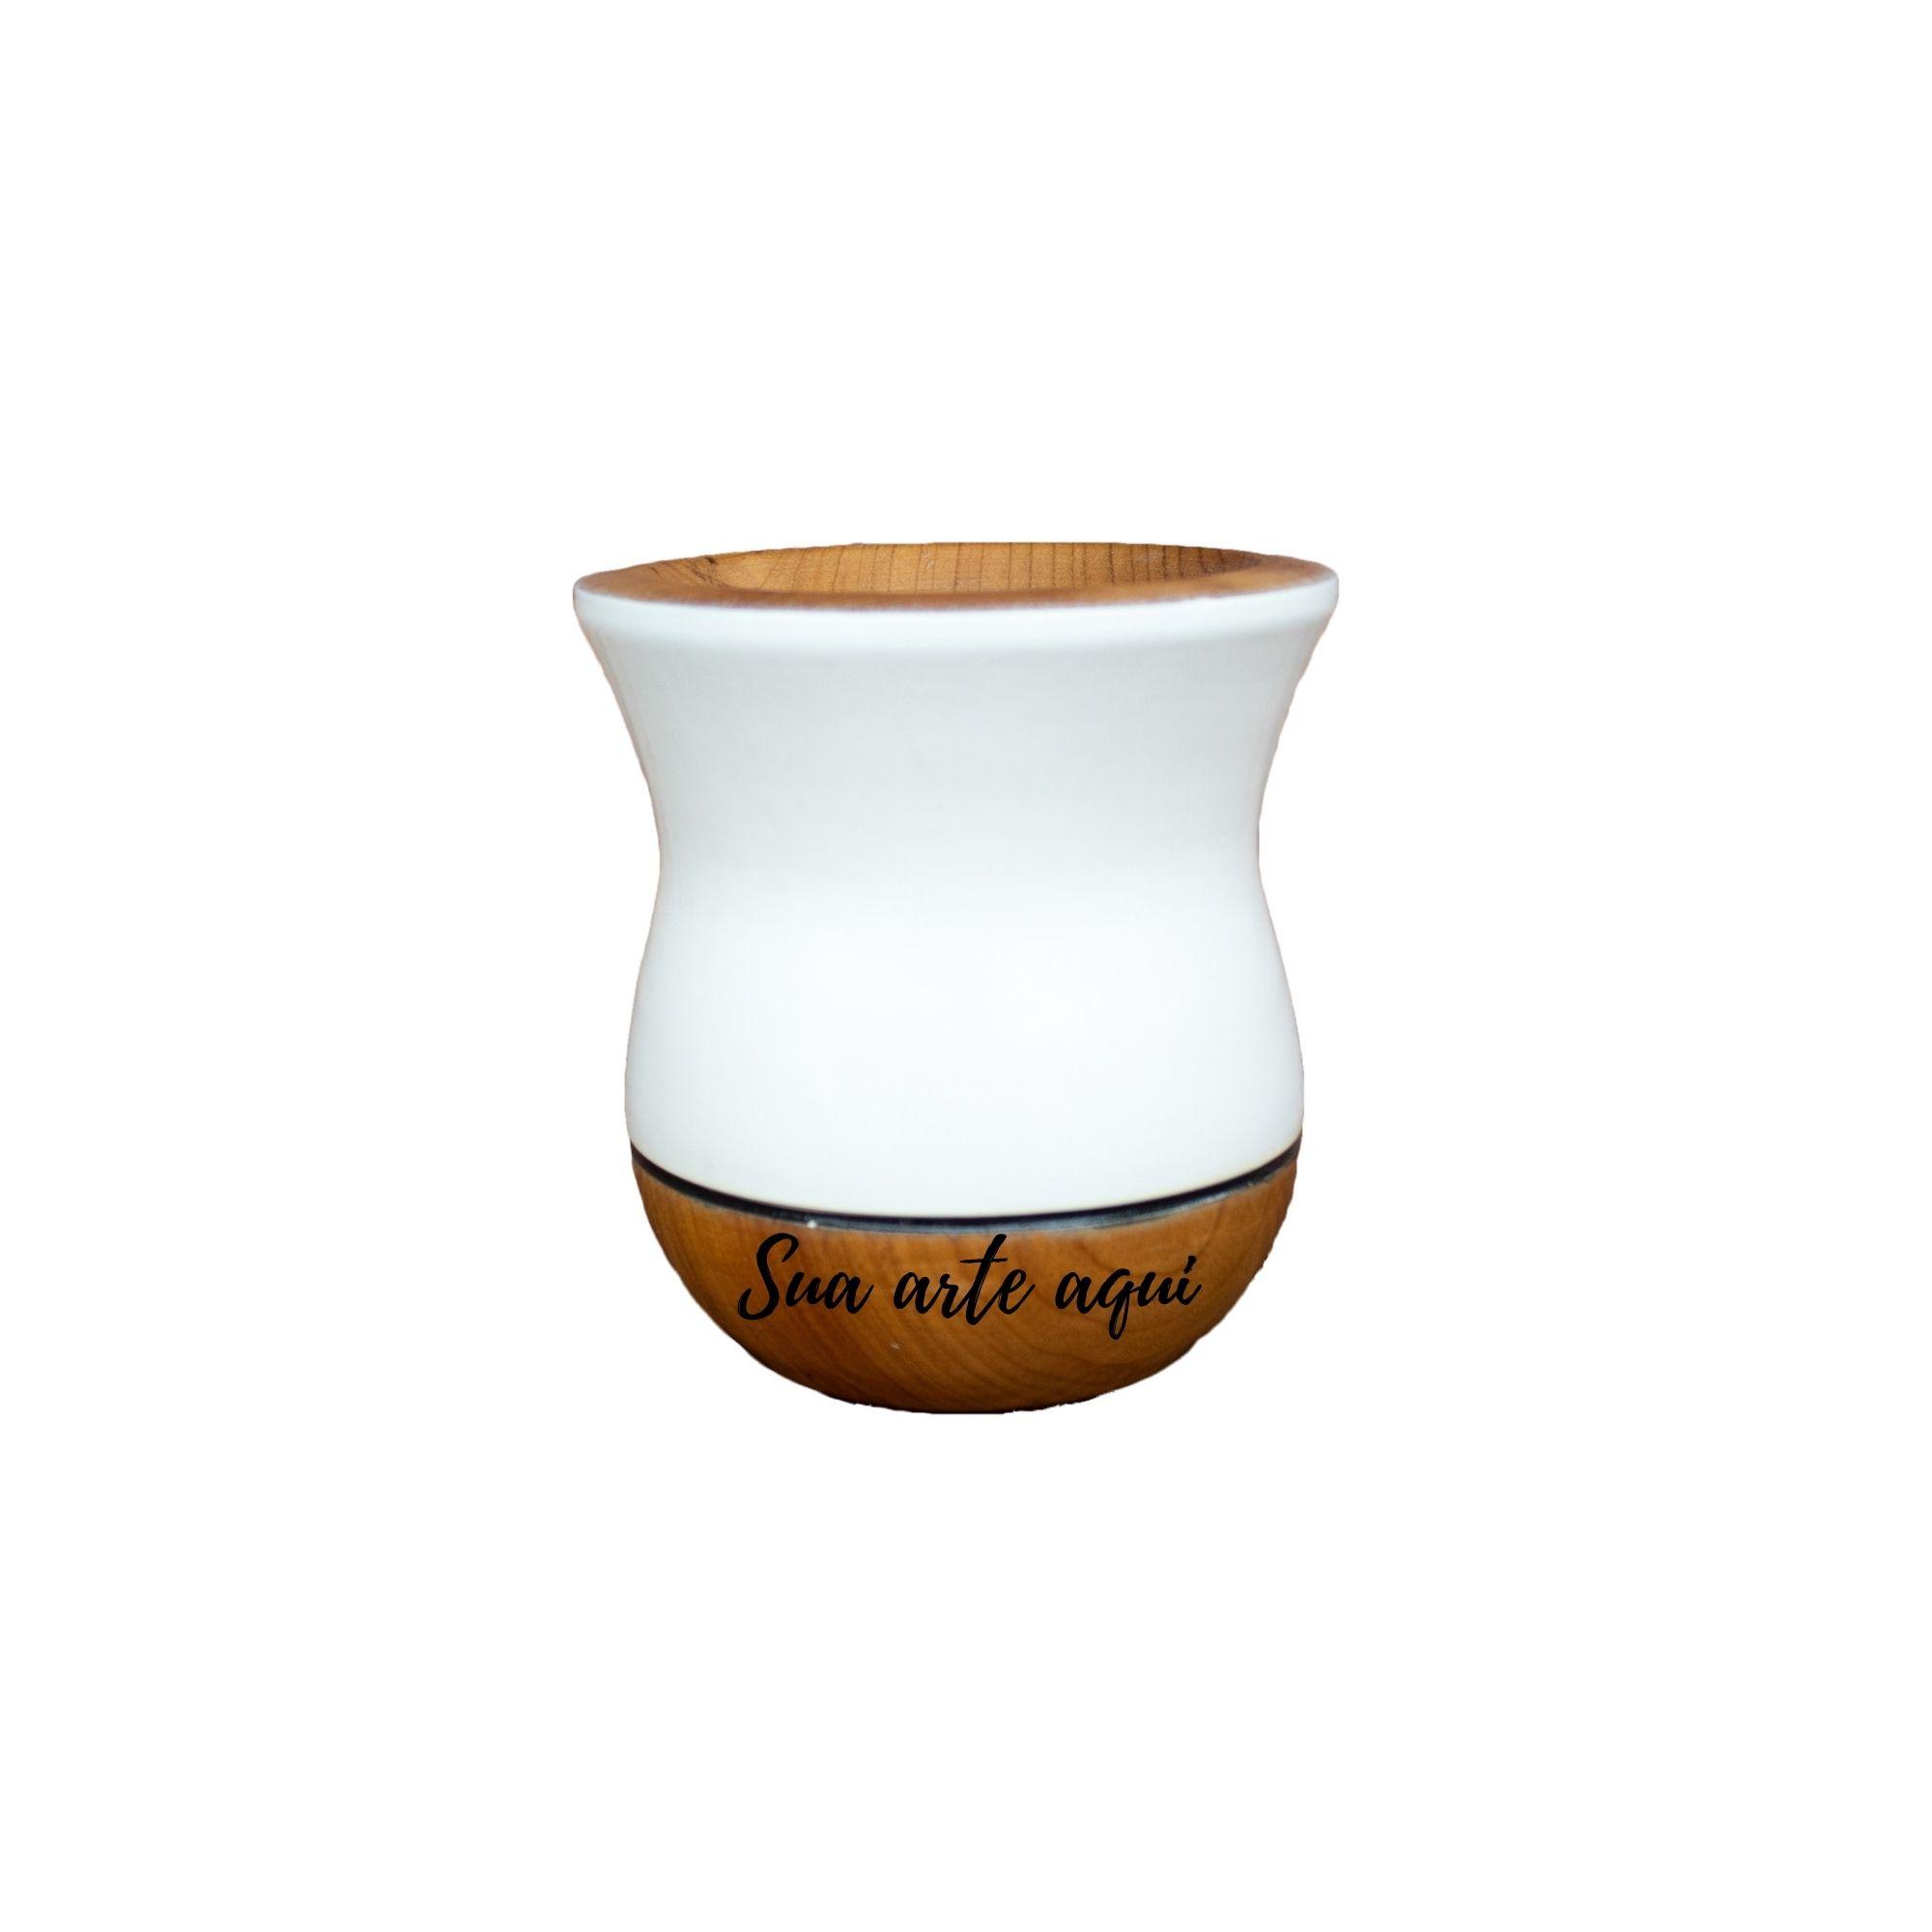 Cuia Madeira bicolor imbuia branca personalizada